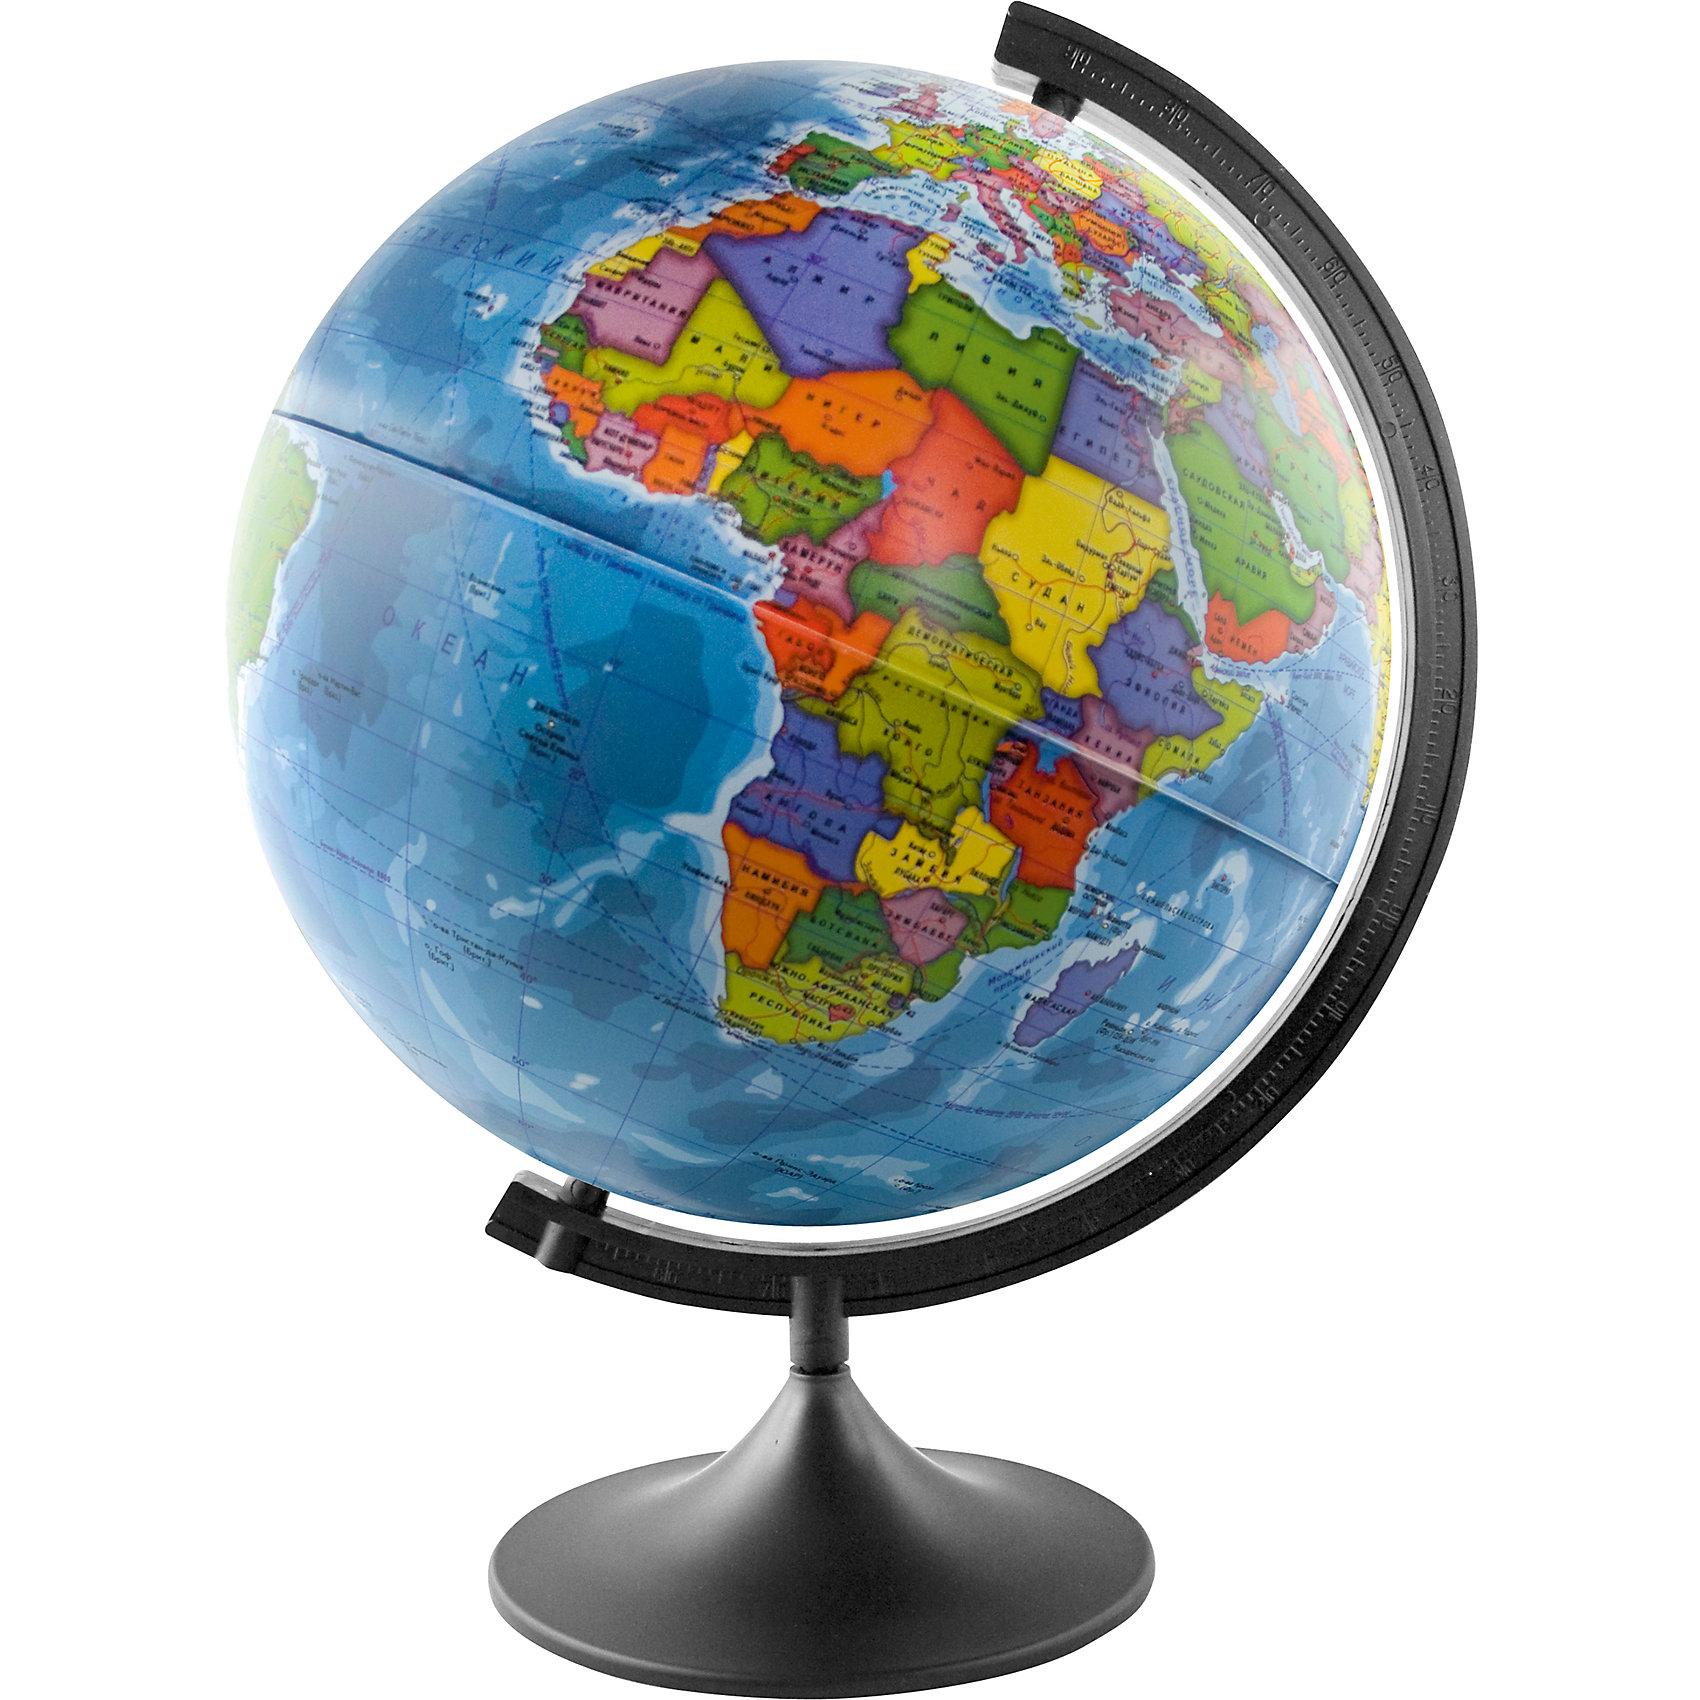 Глобус Земли, политический, диаметр 320Последняя цена<br>Глобус Земли д-р 320 политический<br><br>Ширина мм: 410<br>Глубина мм: 320<br>Высота мм: 320<br>Вес г: 250<br>Возраст от месяцев: 36<br>Возраст до месяцев: 2147483647<br>Пол: Унисекс<br>Возраст: Детский<br>SKU: 4801665